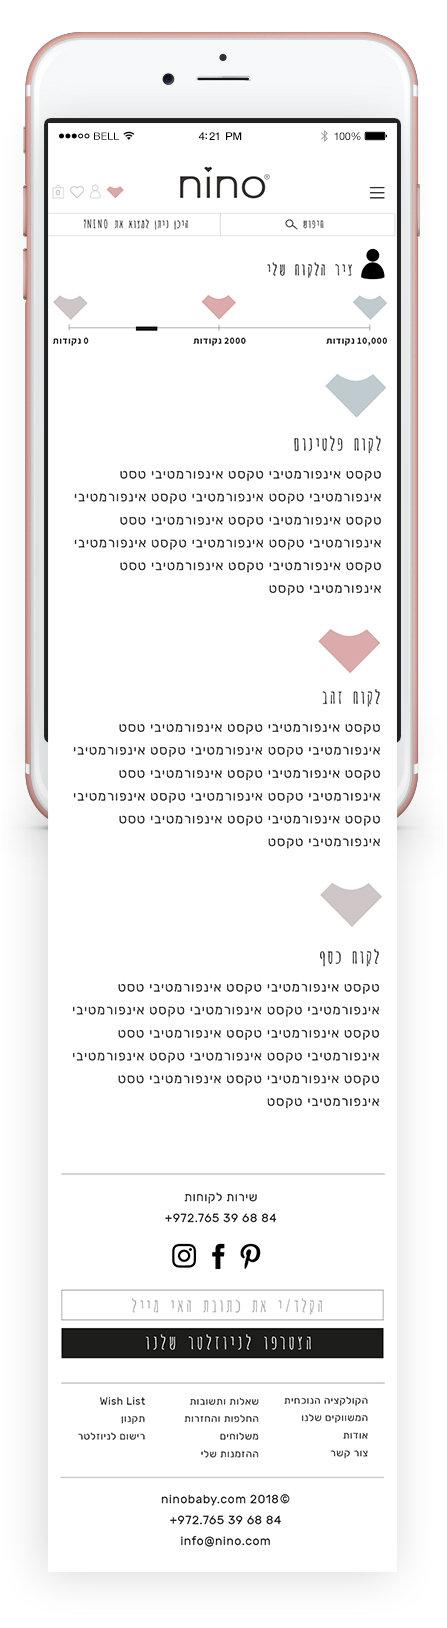 NINO-mobile-costumers info.jpg